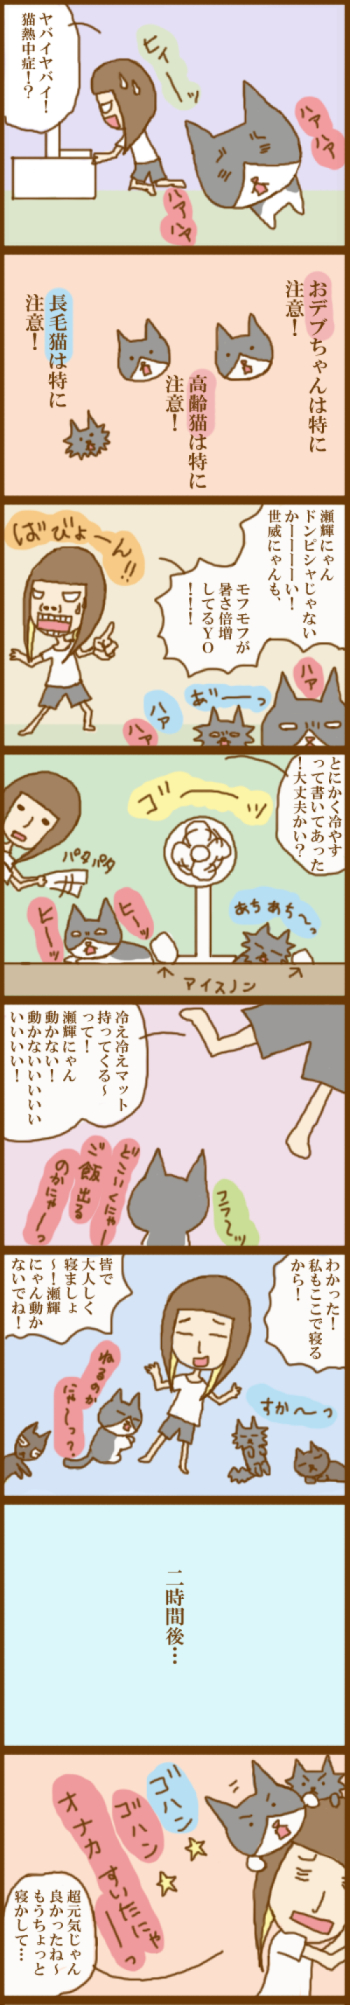 f:id:suzuokayu:20201124092741j:plain